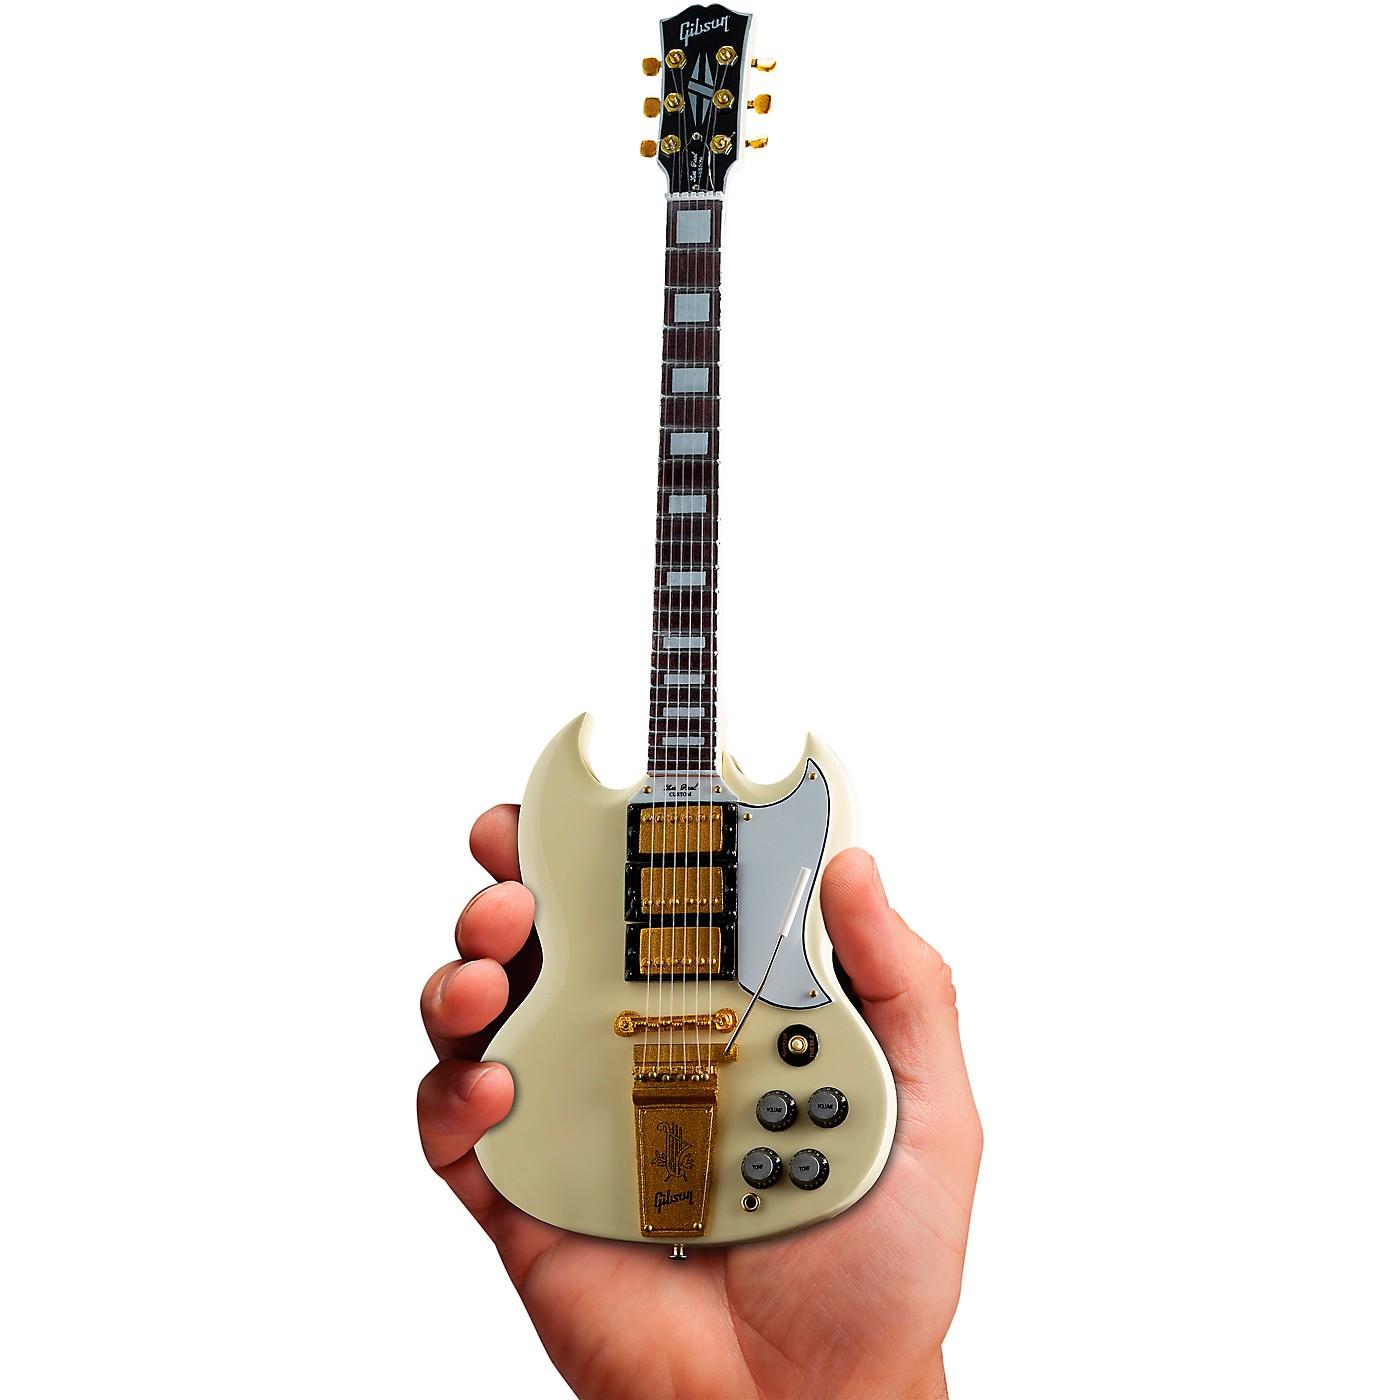 Axe Heaven Gibson 1964 SG Custom White Officially Licensed Miniature Guitar Replica thumbnail